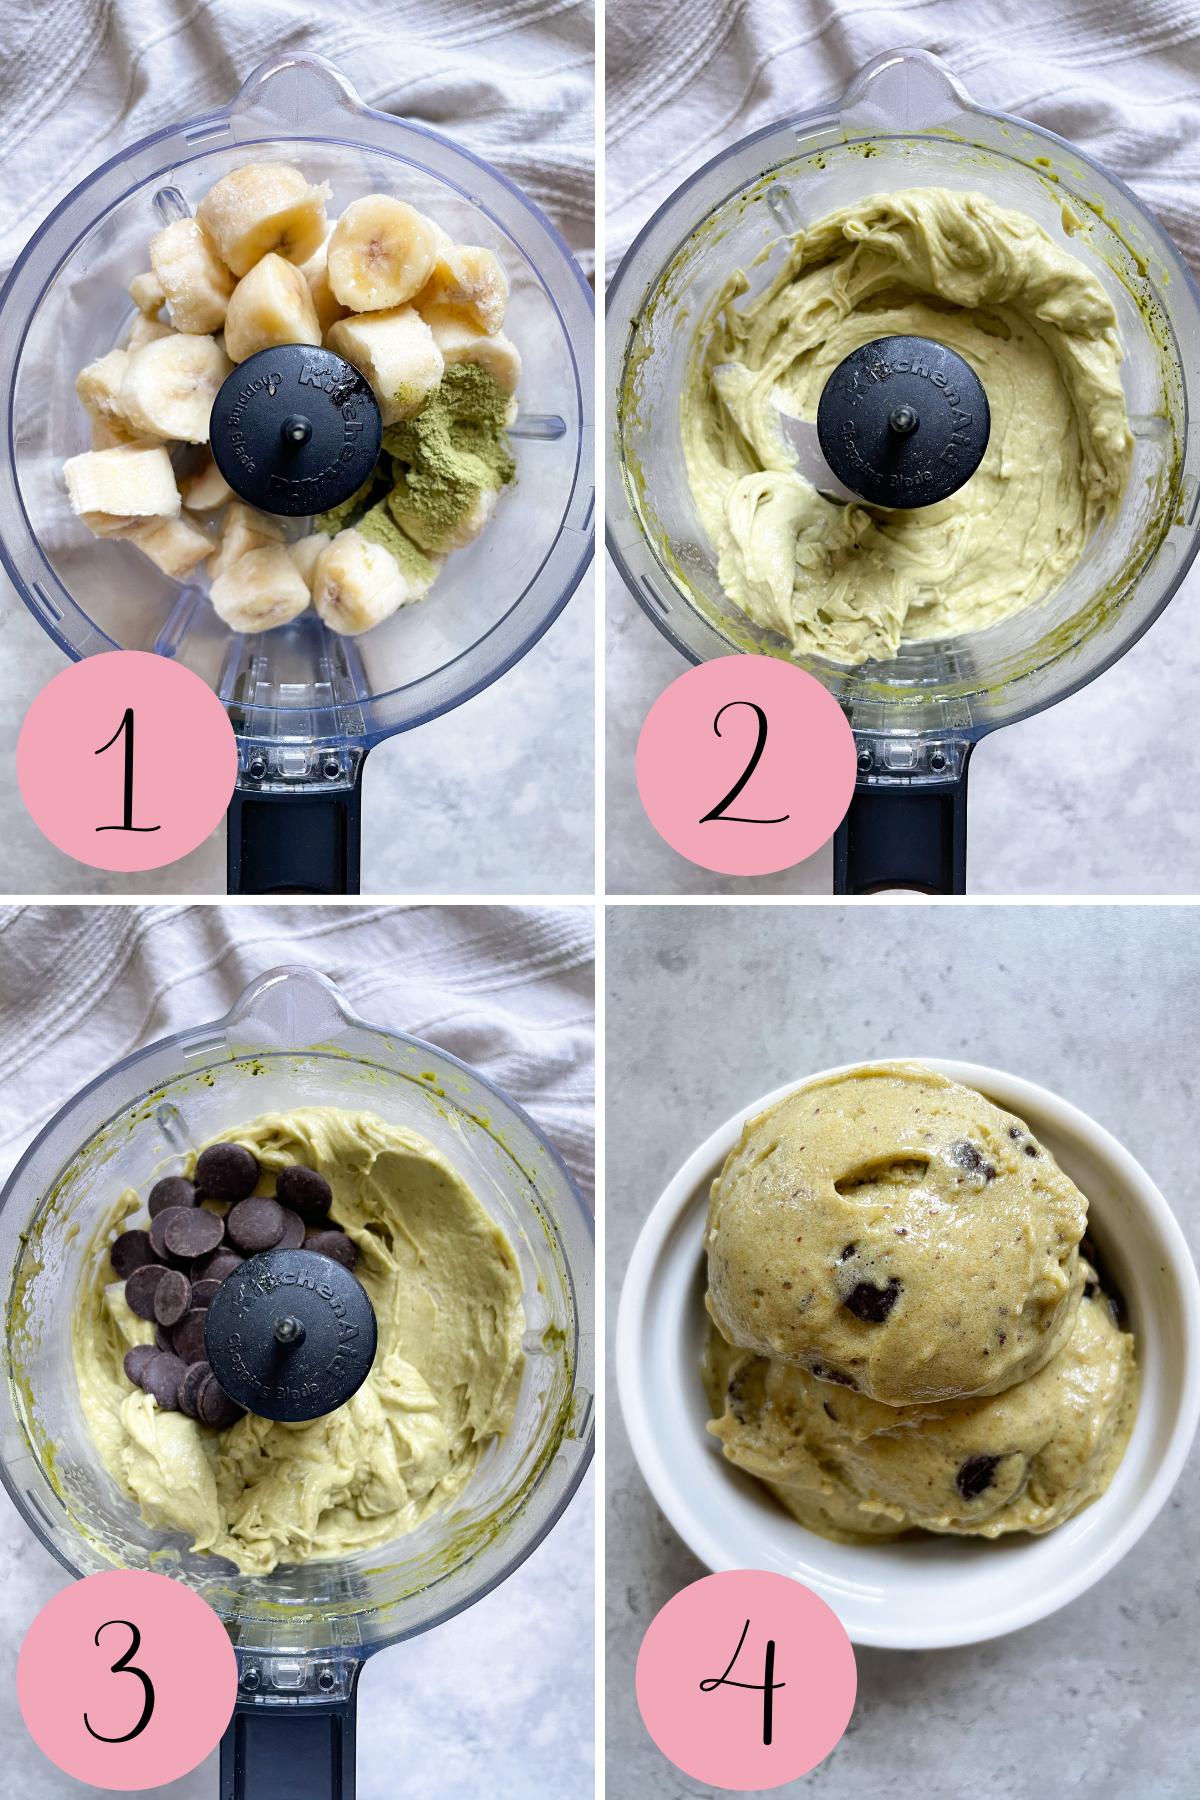 4 step process how to make banana ice cream